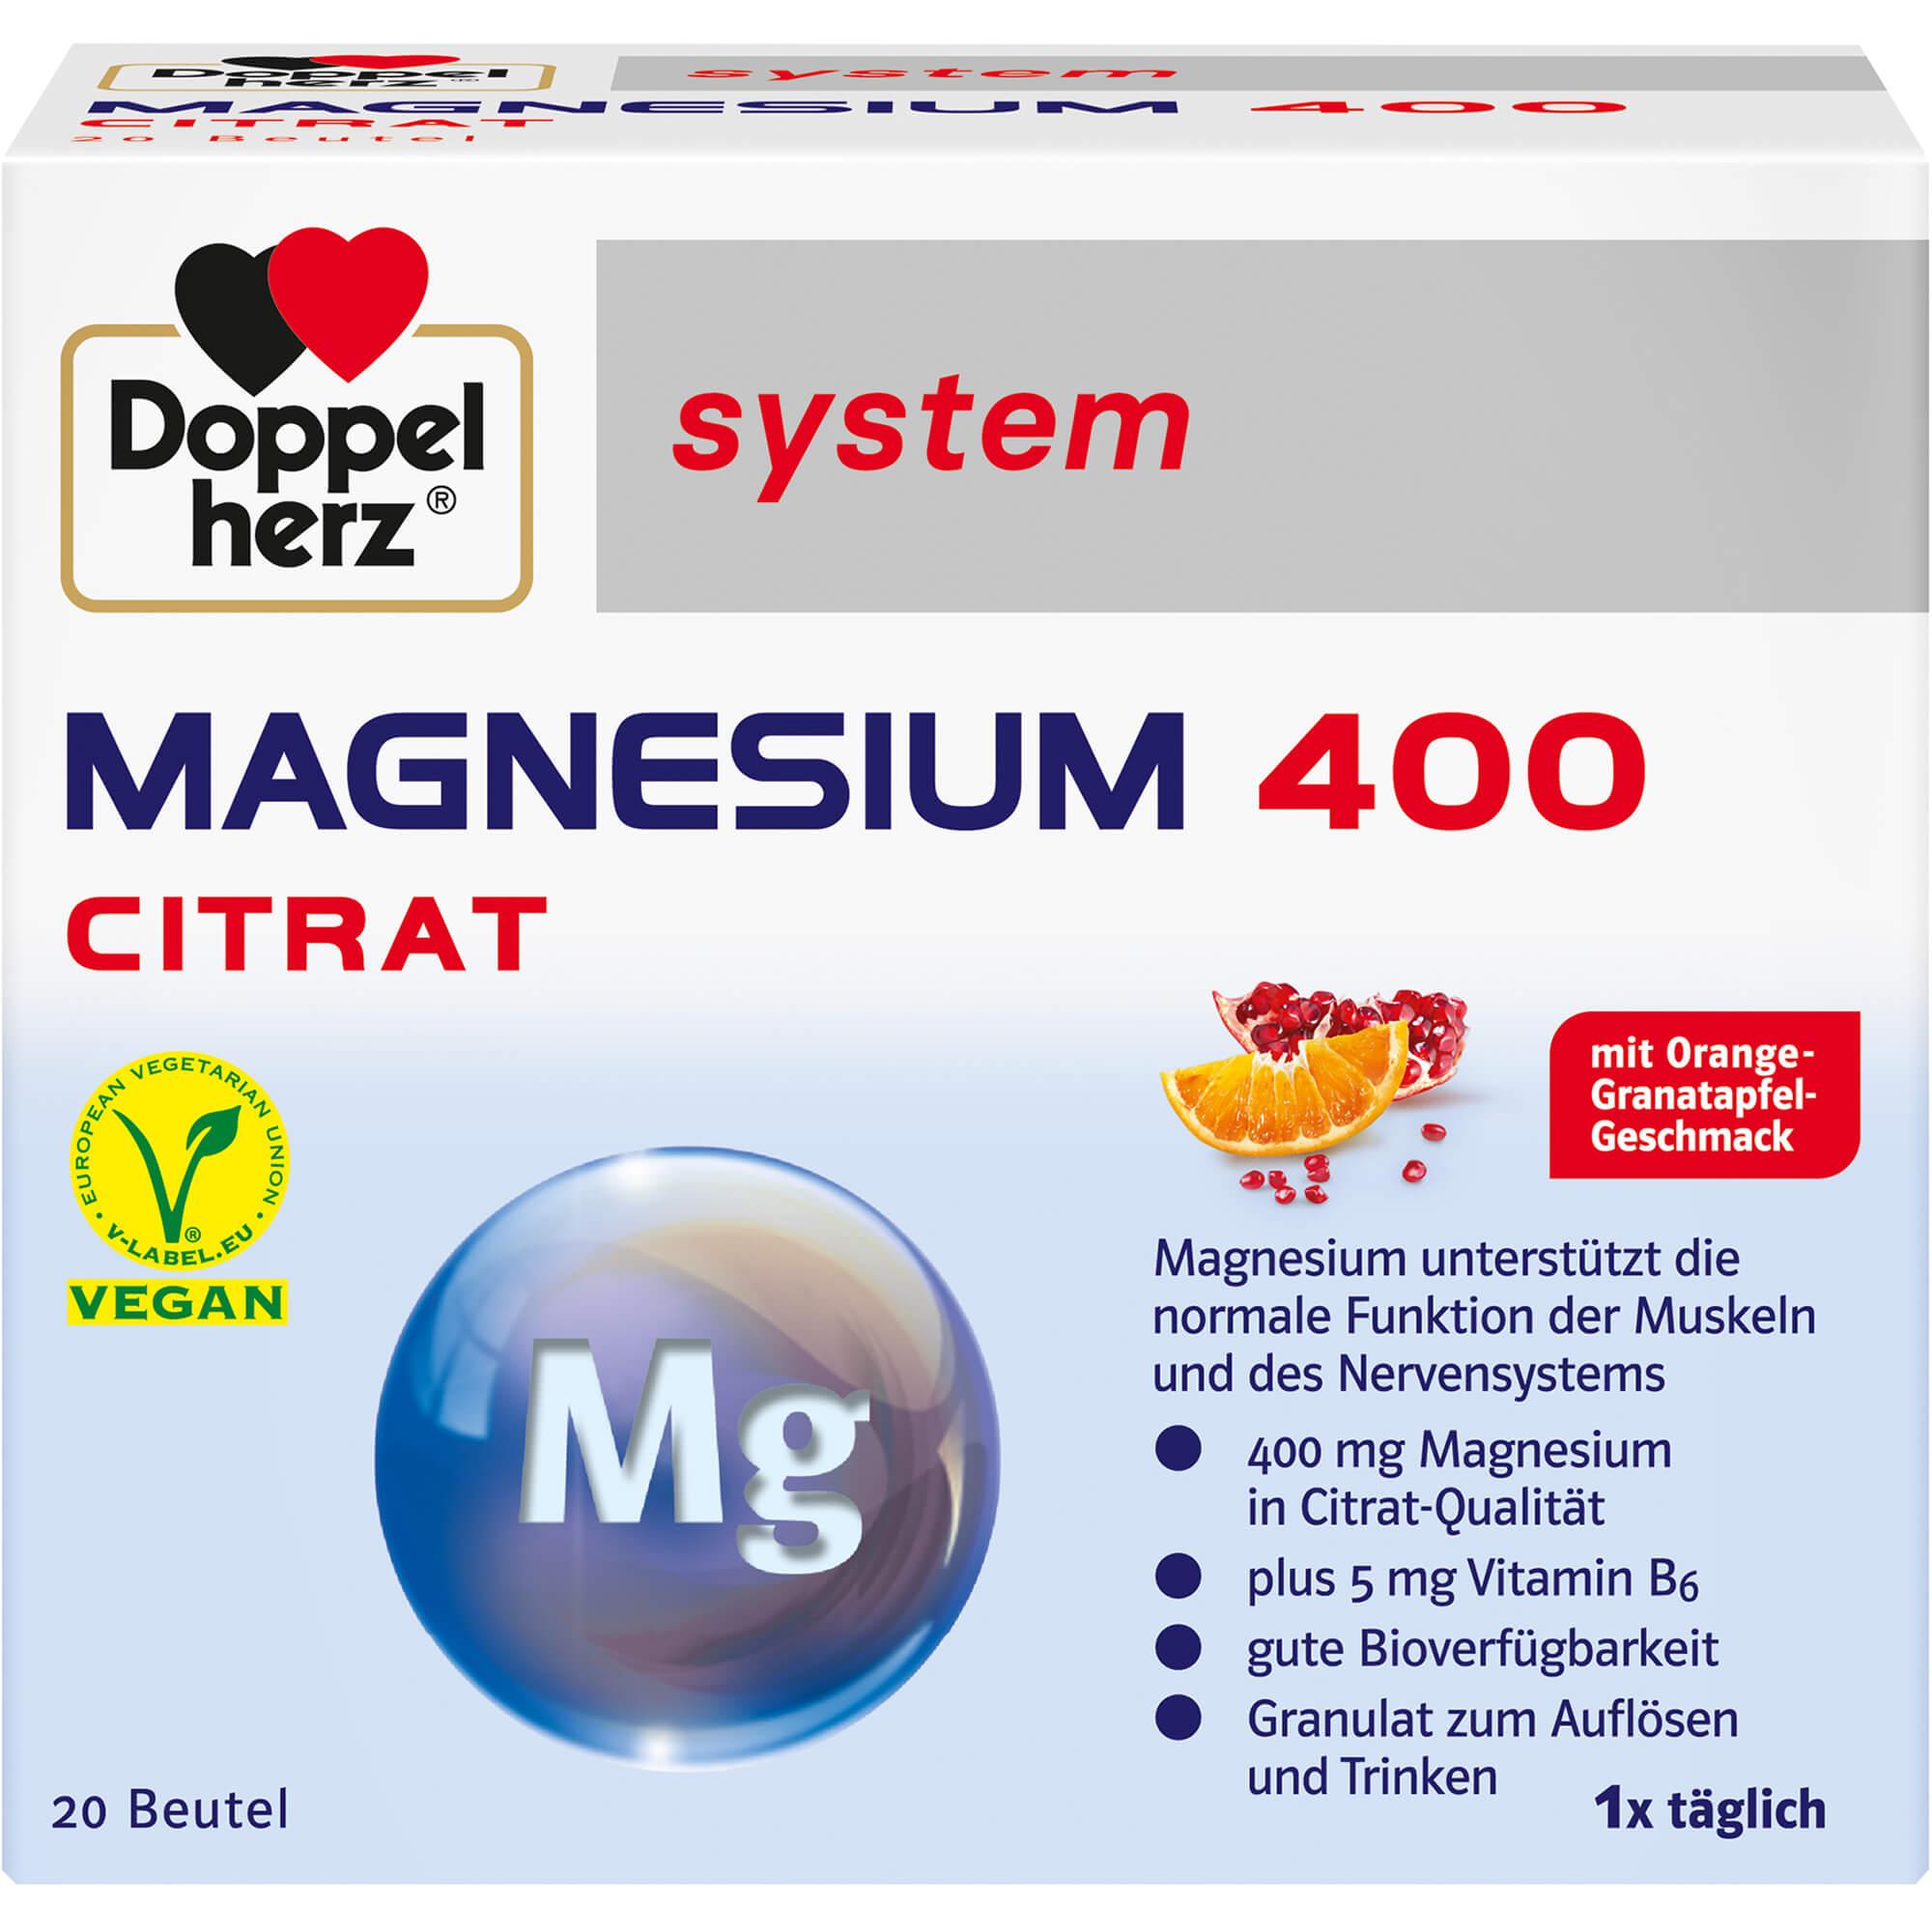 DOPPELHERZ-Magnesium-400-Citrat-system-Granulat